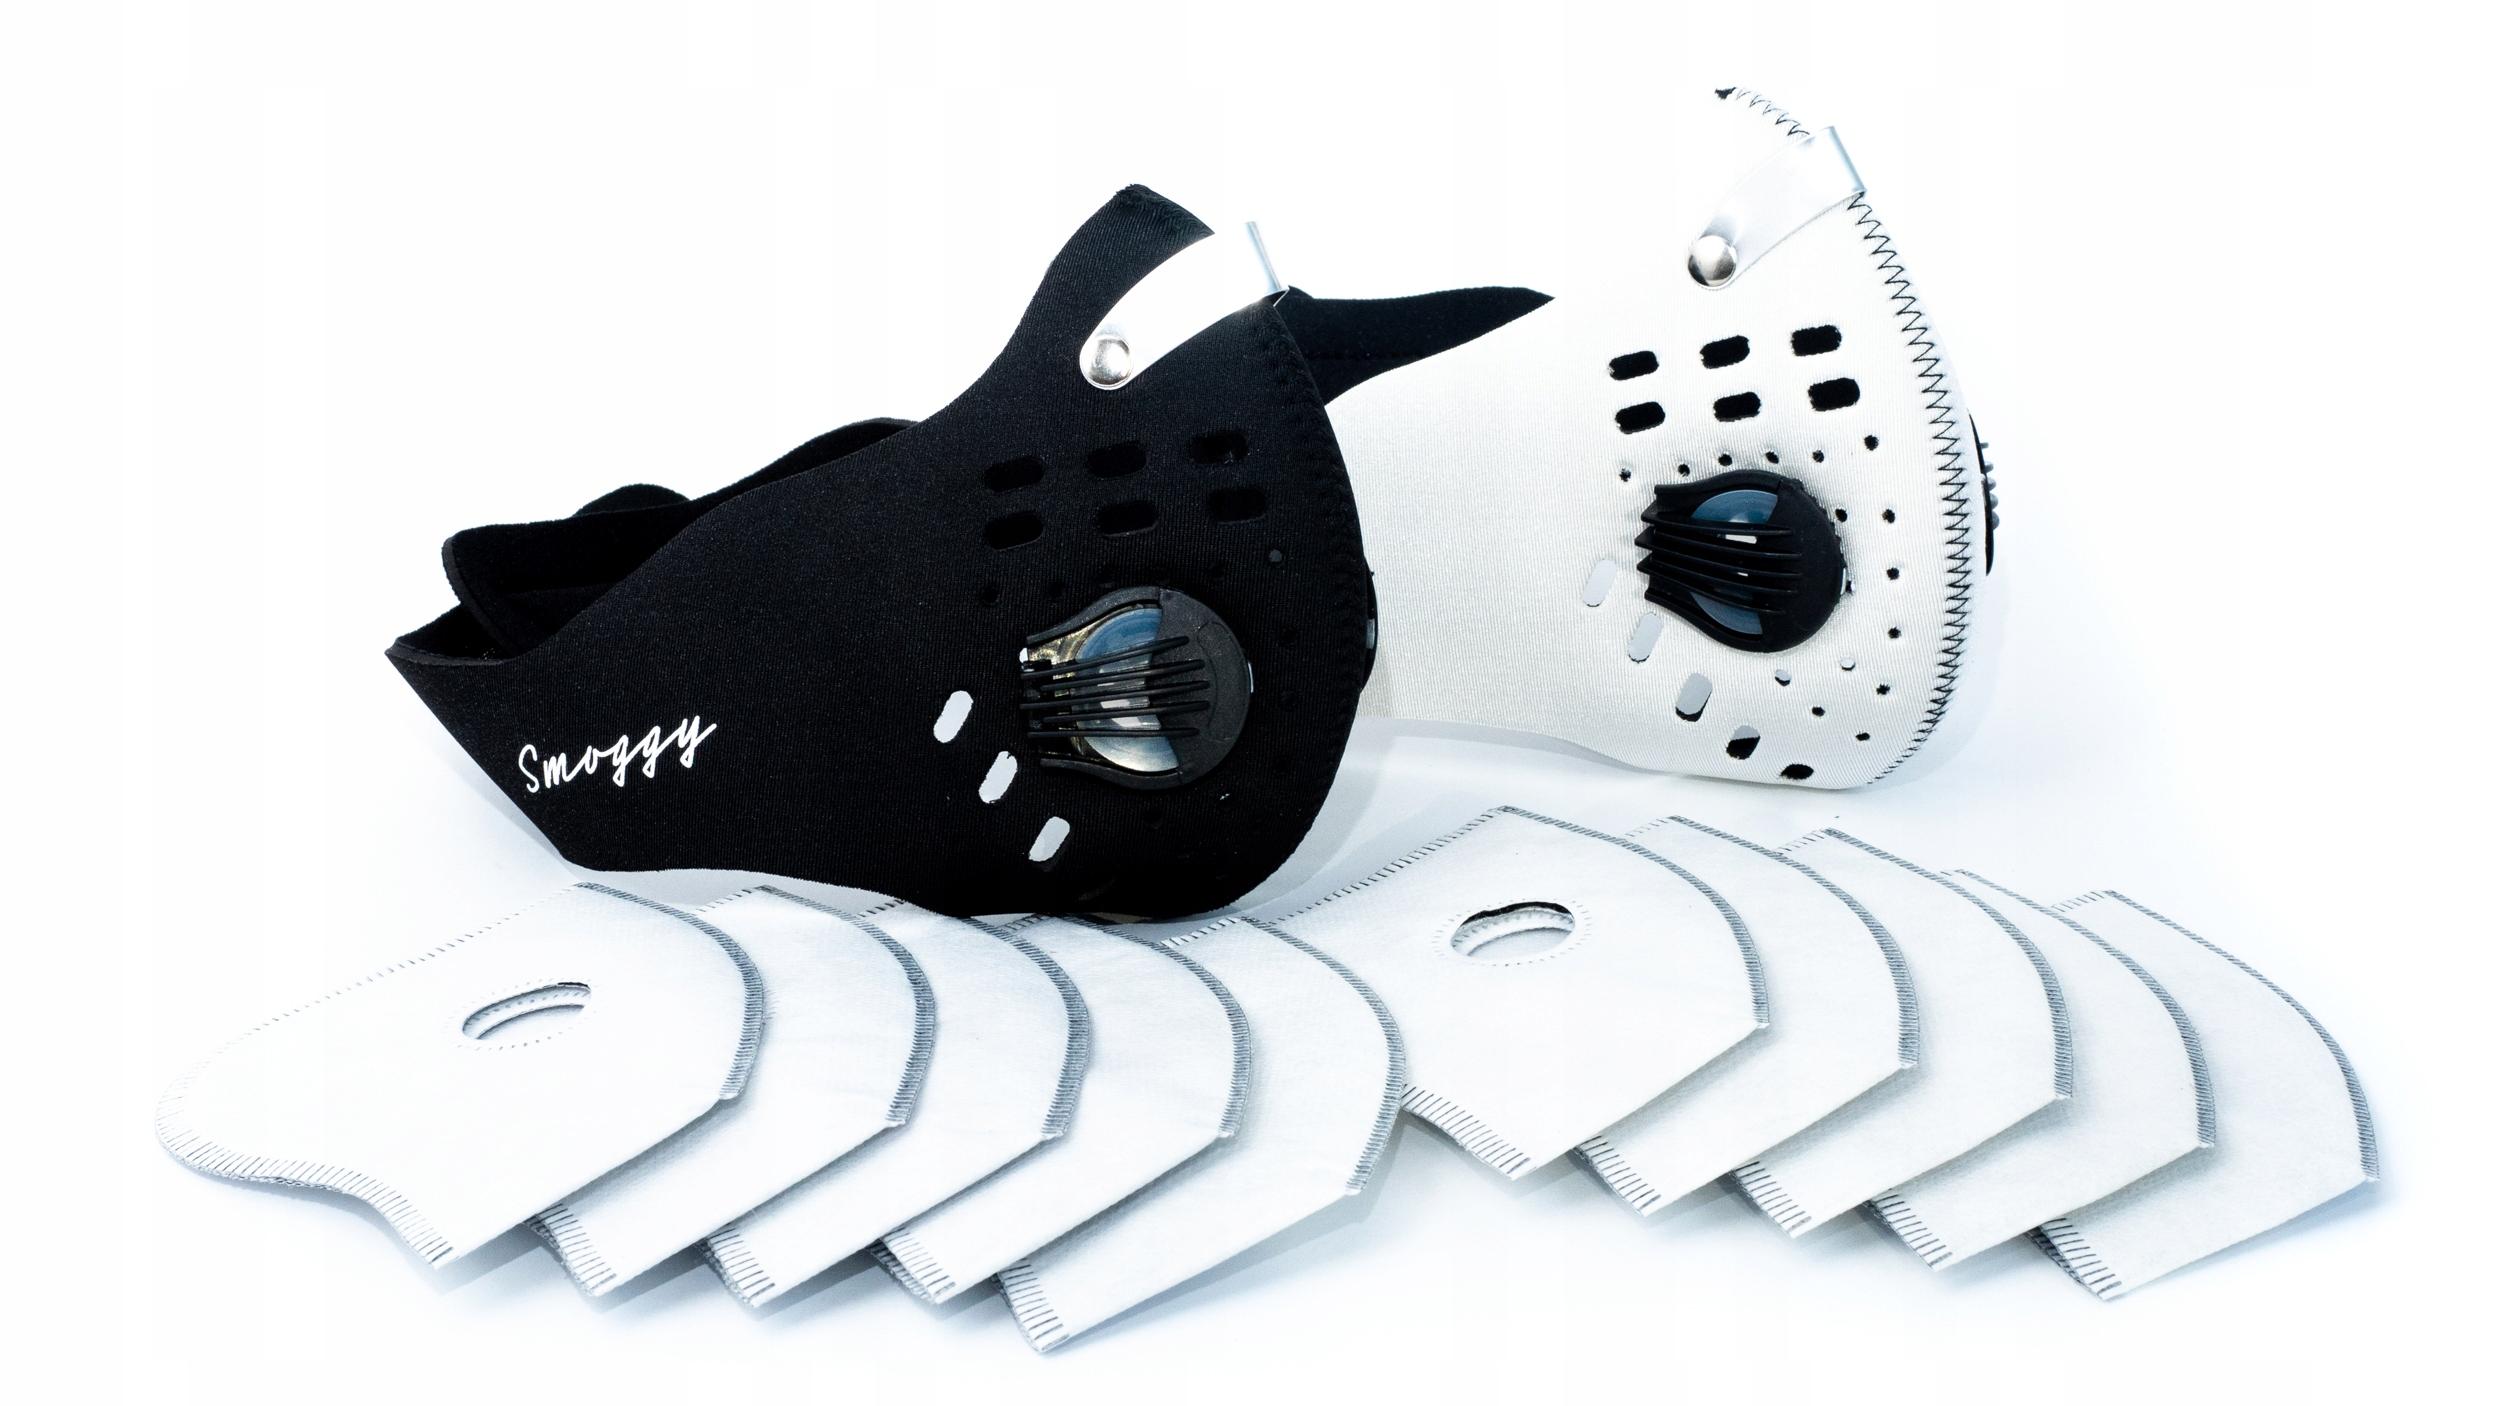 2x Maska antysmogowa +10x filtr N99 HEPA pm2.5